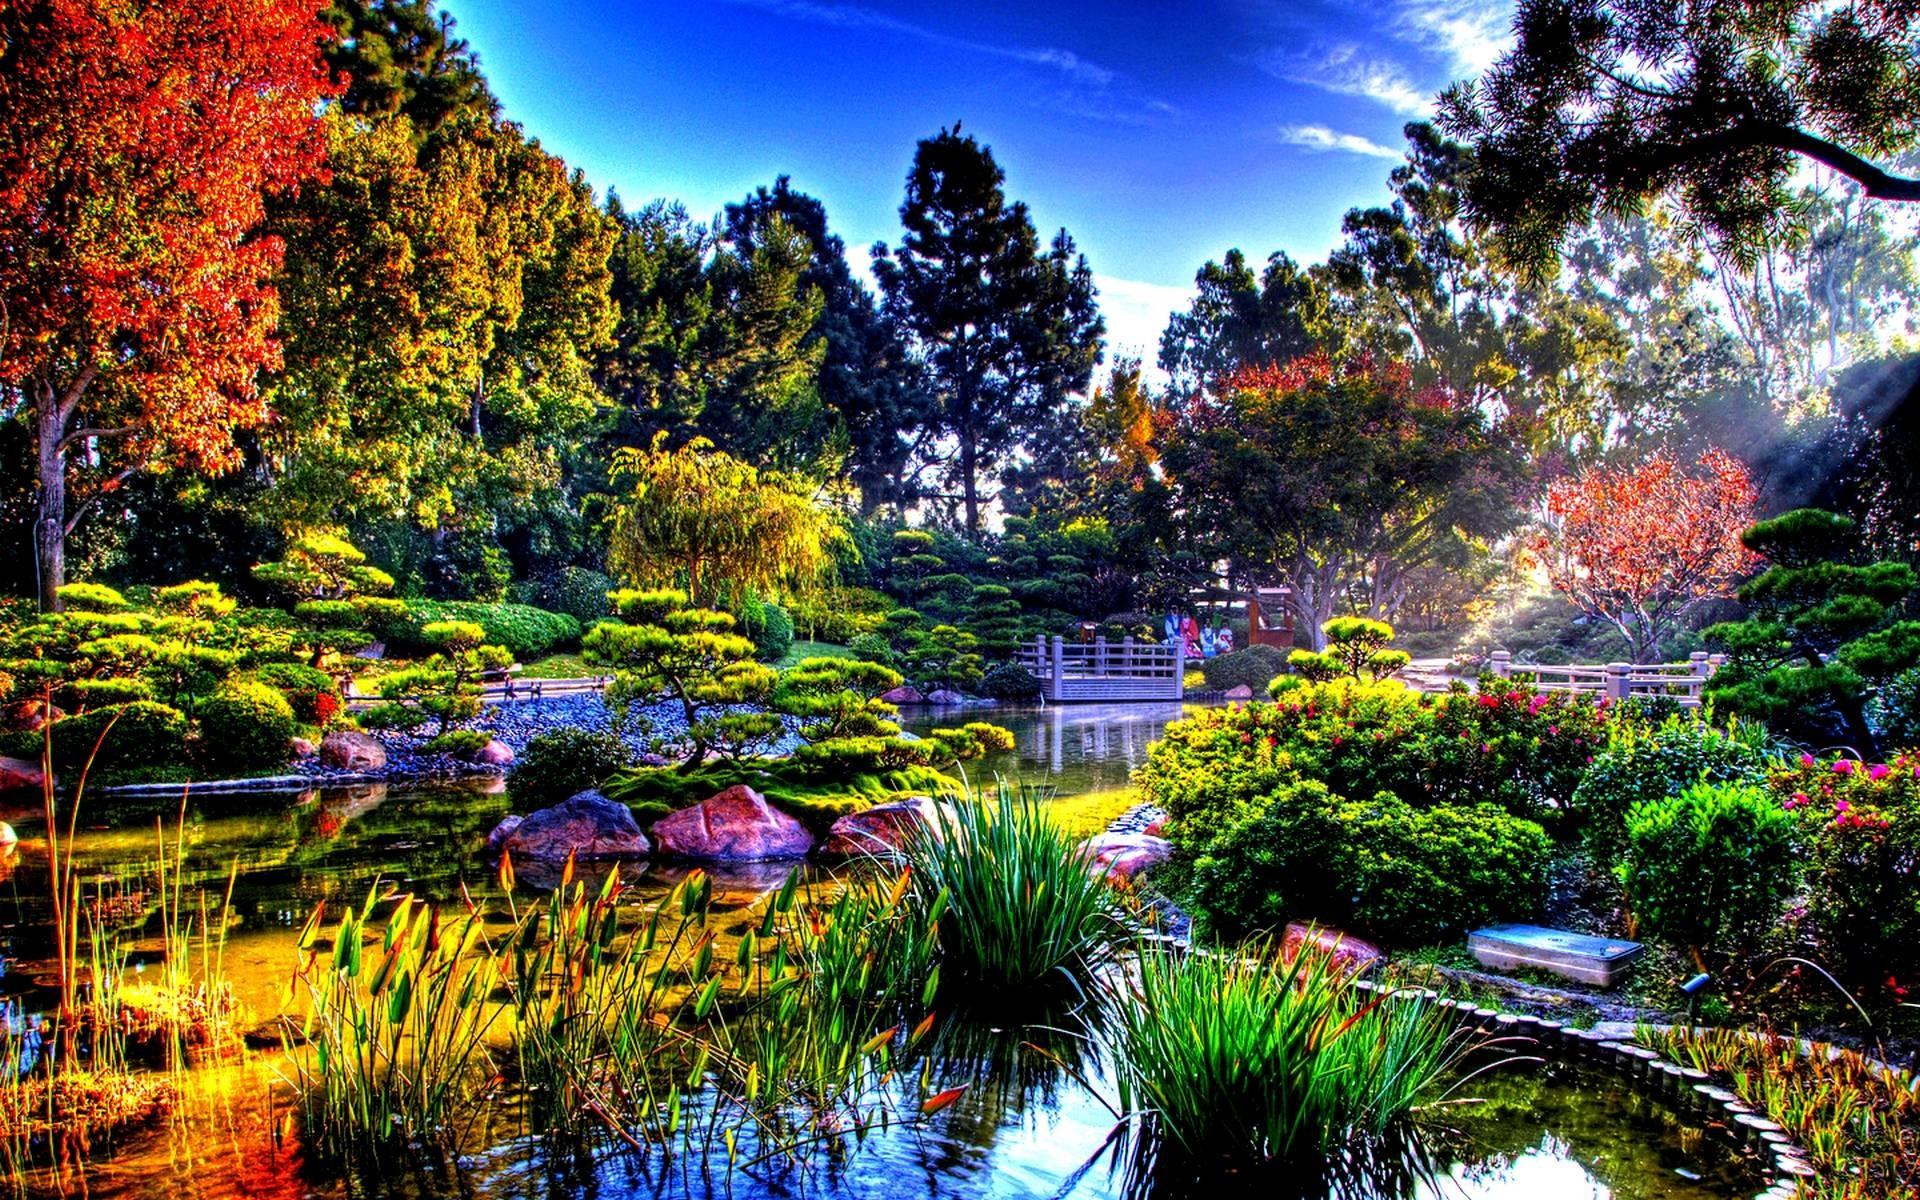 Res: 1920x1200, Beautiful Flower Garden Images HD Wallpapers | Beautiful images HD Pictures  & Desktop Wallpapers